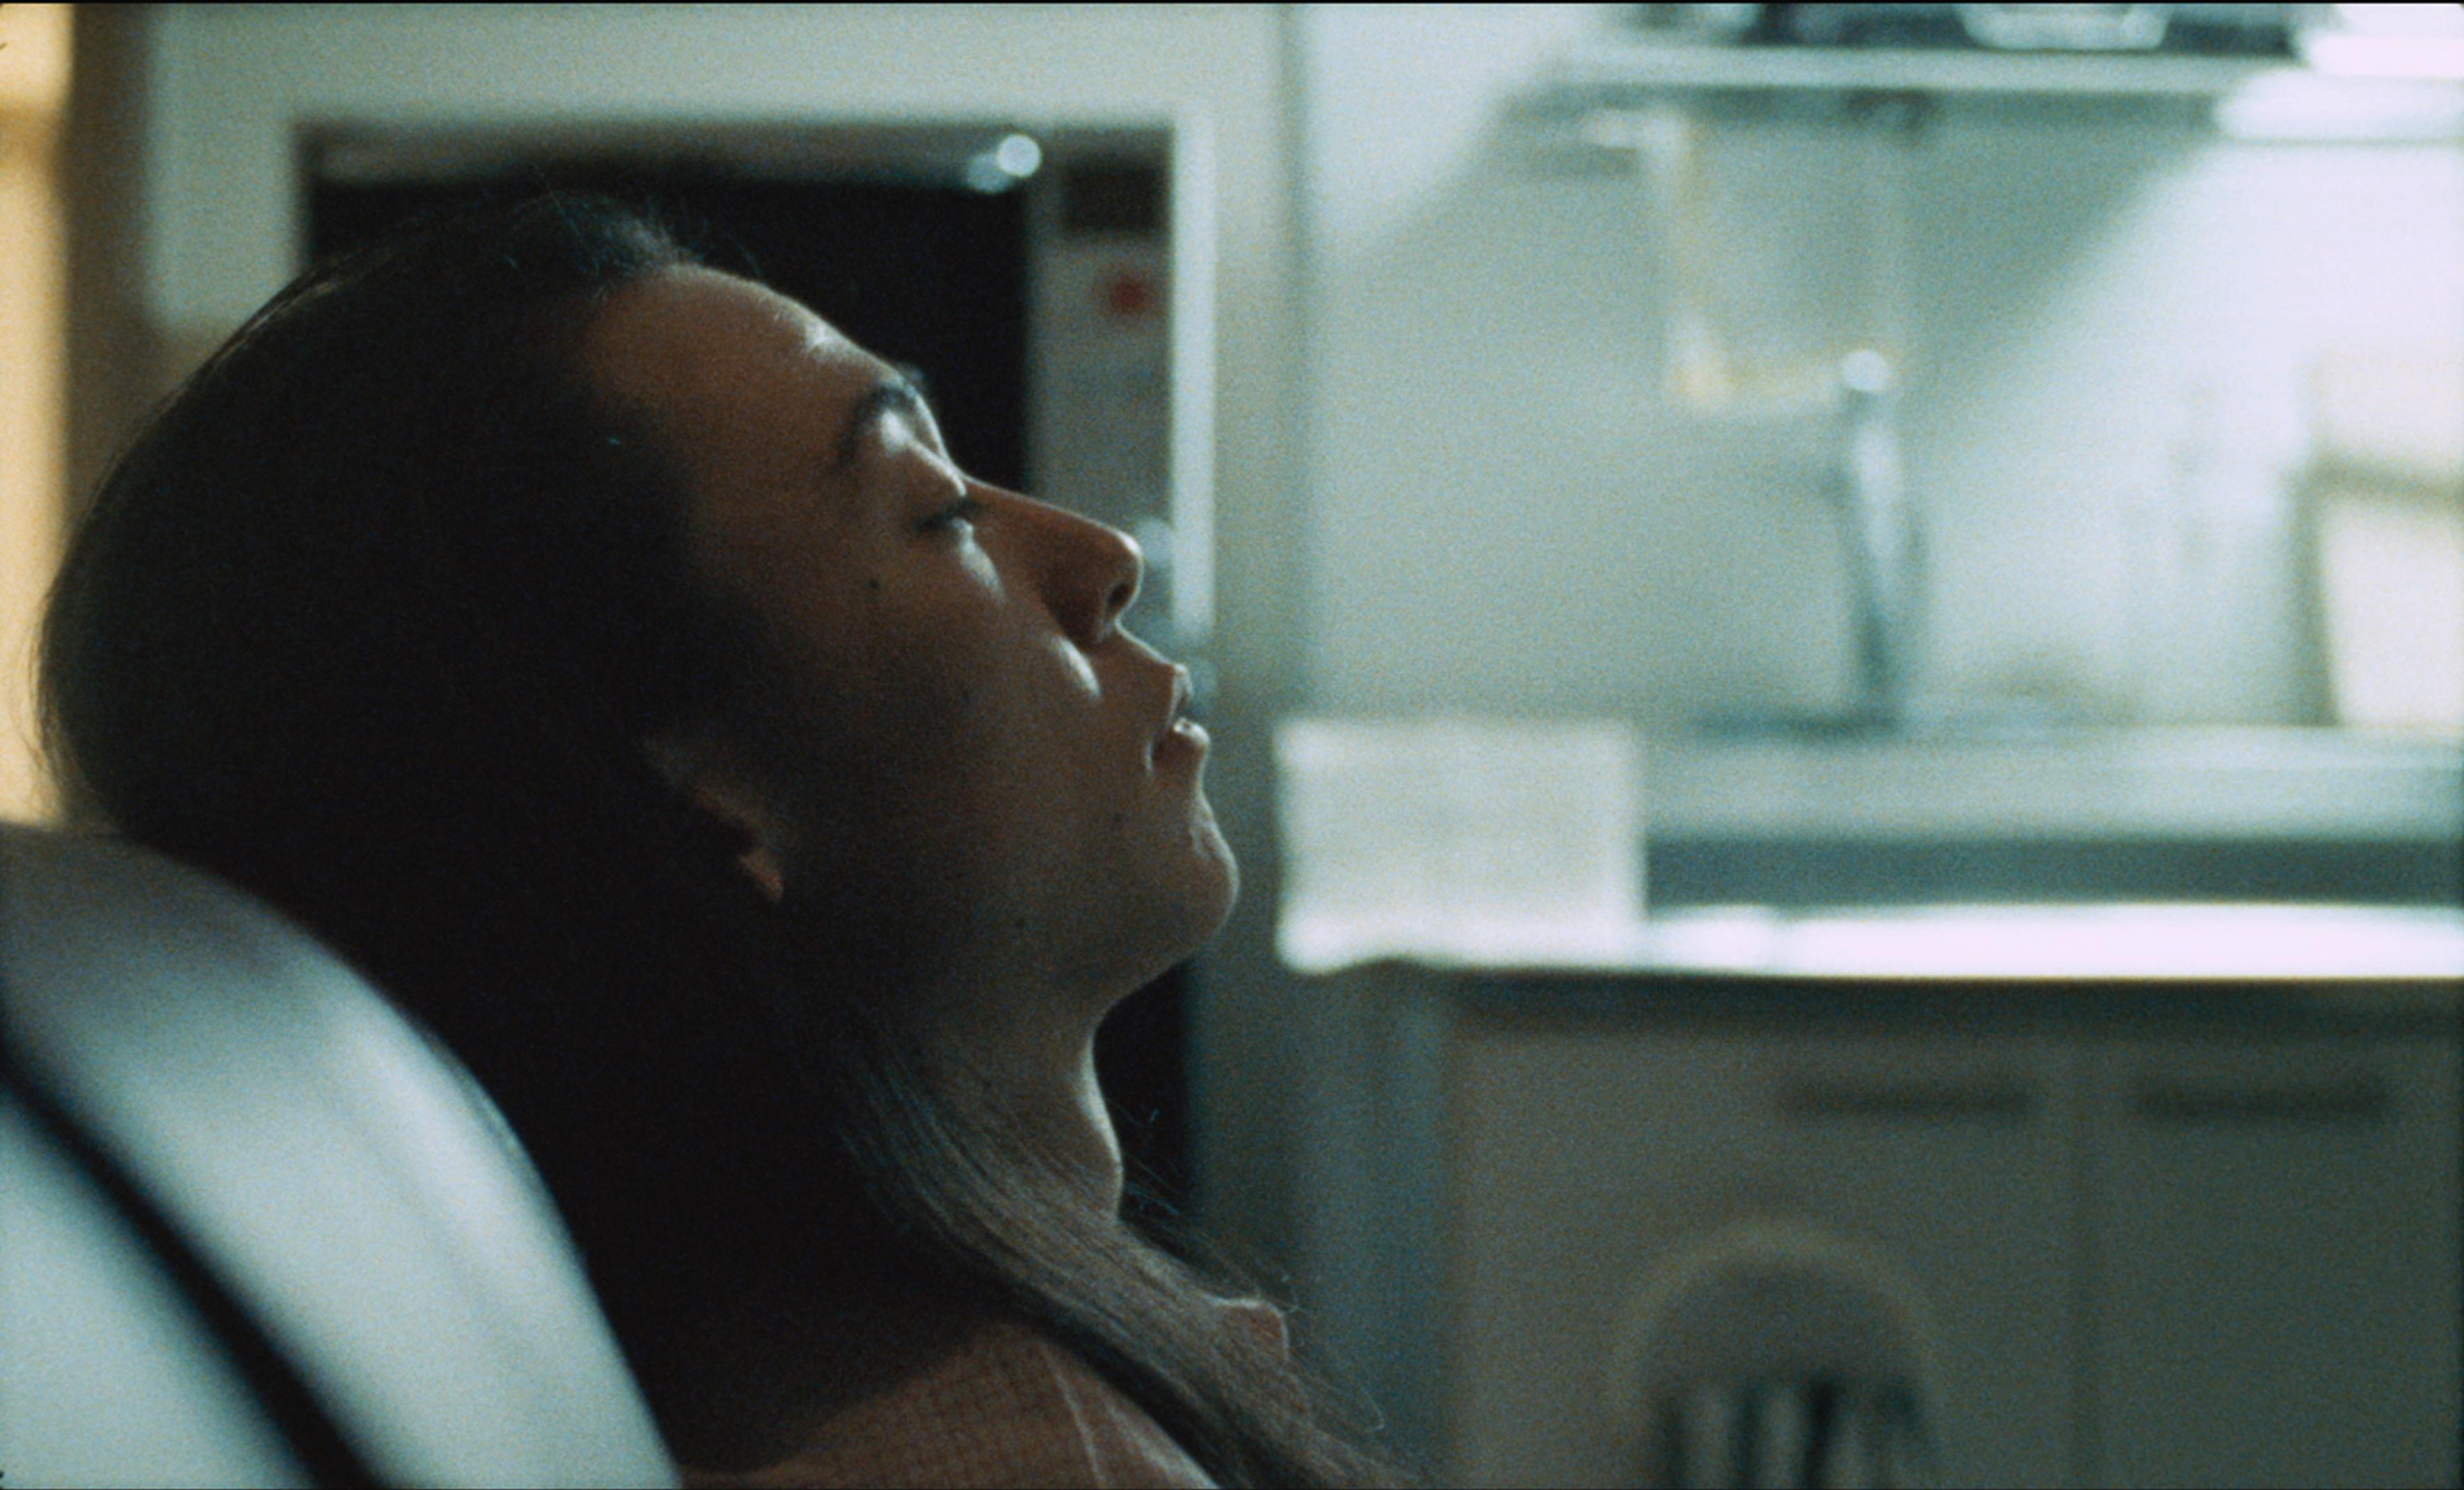 Image of a woman sleeping, a still from Ane Hjort Guttu and Daisuke Kosugi's video work, entitled The Lost Dreams of Naoki Hayakawa, dated 2016